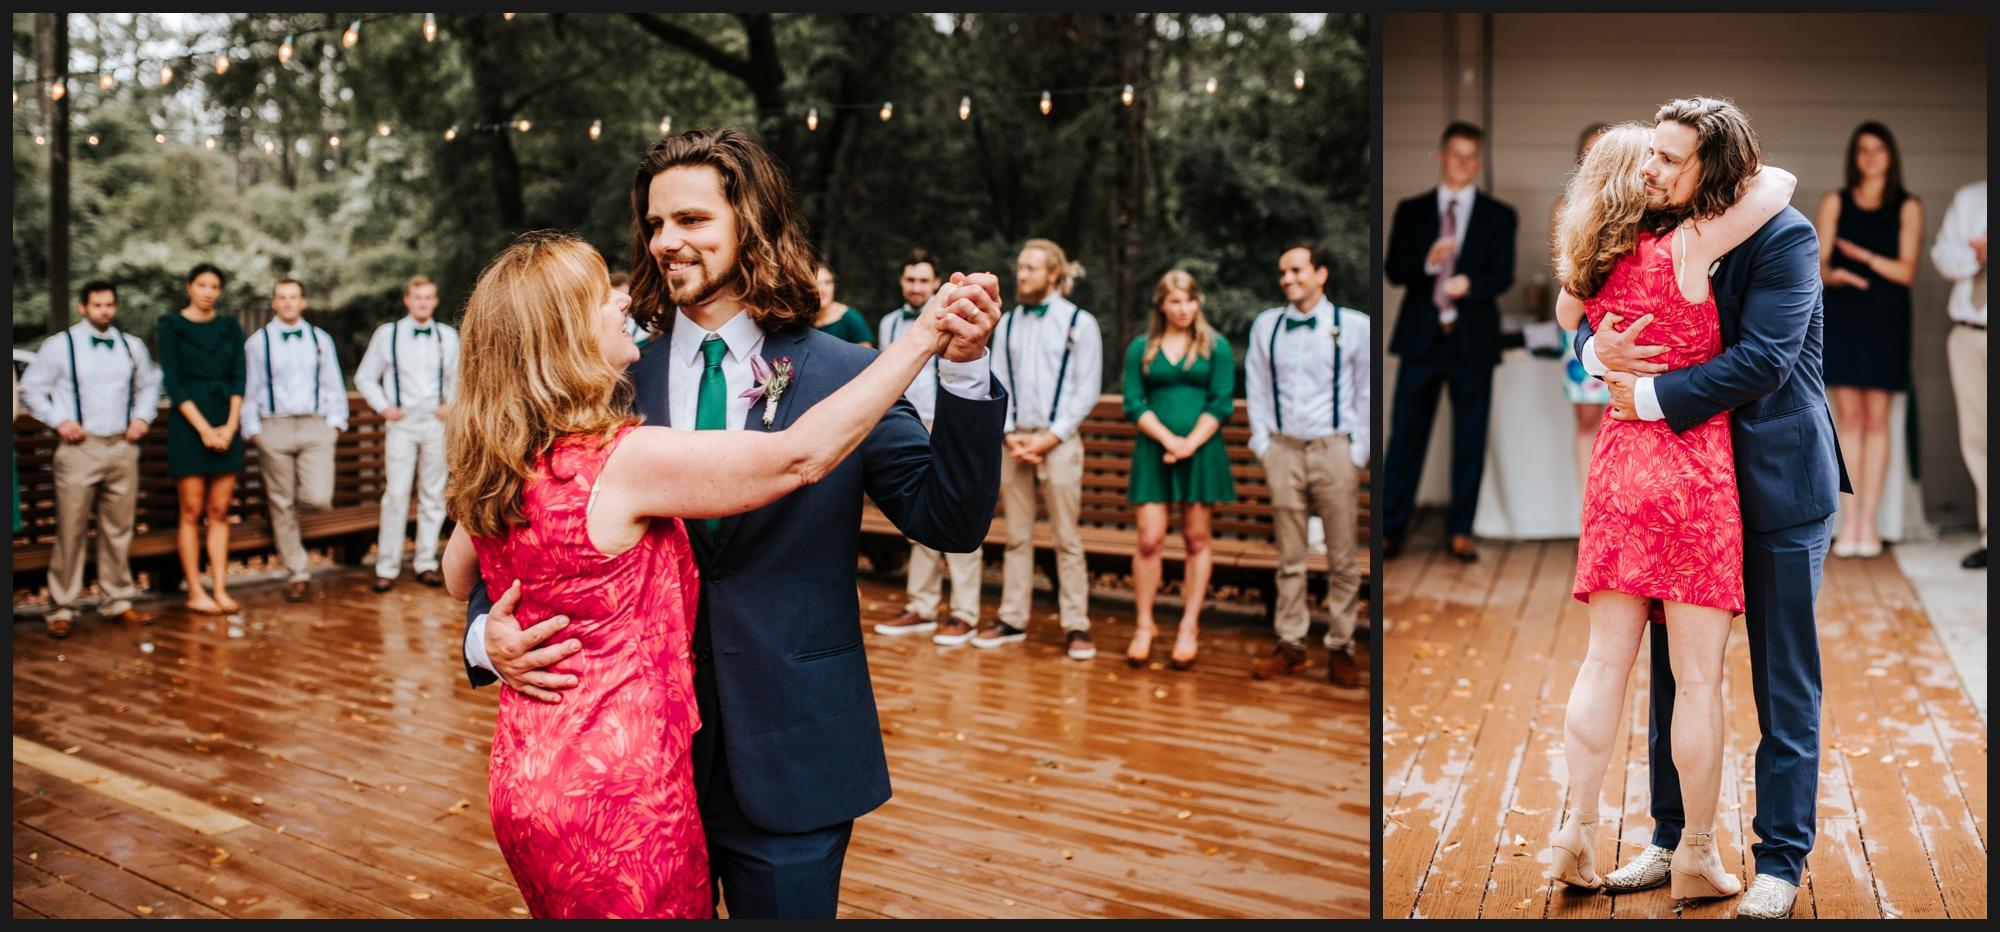 Orlando-Wedding-Photographer_0022.jpg